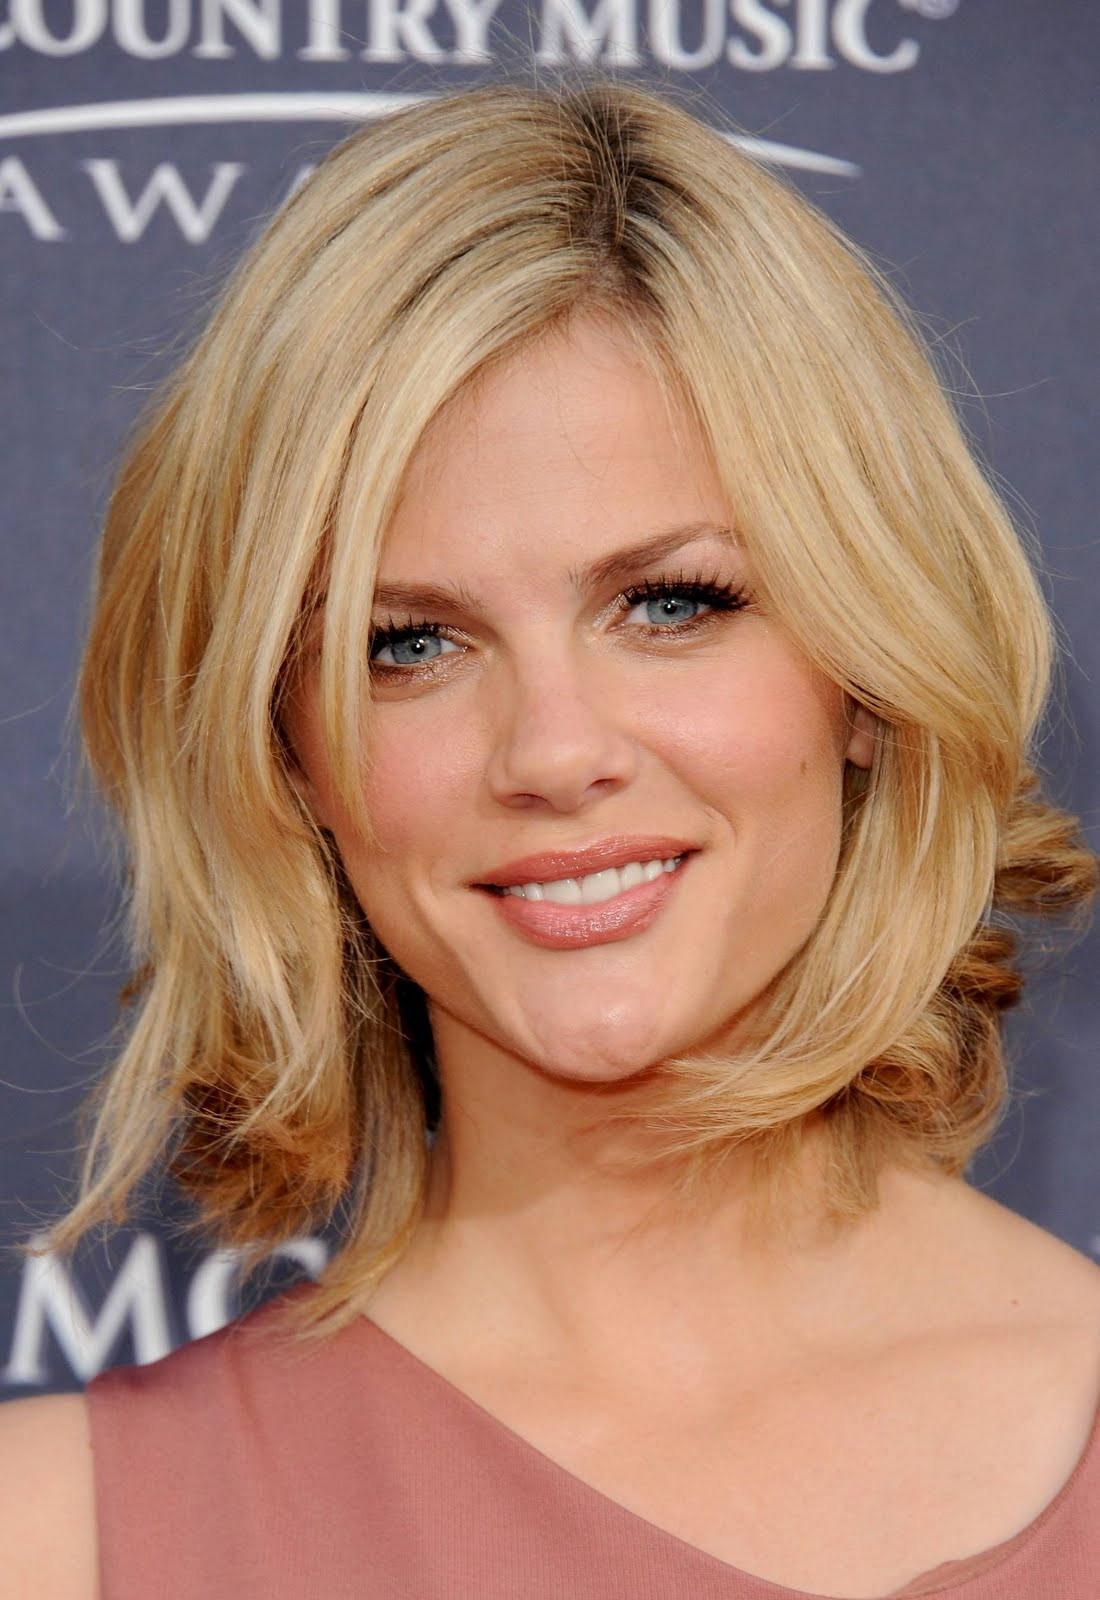 Medium Length Layered Hairstyles  25 Best Layered Hairstyles For Medium Length Hair